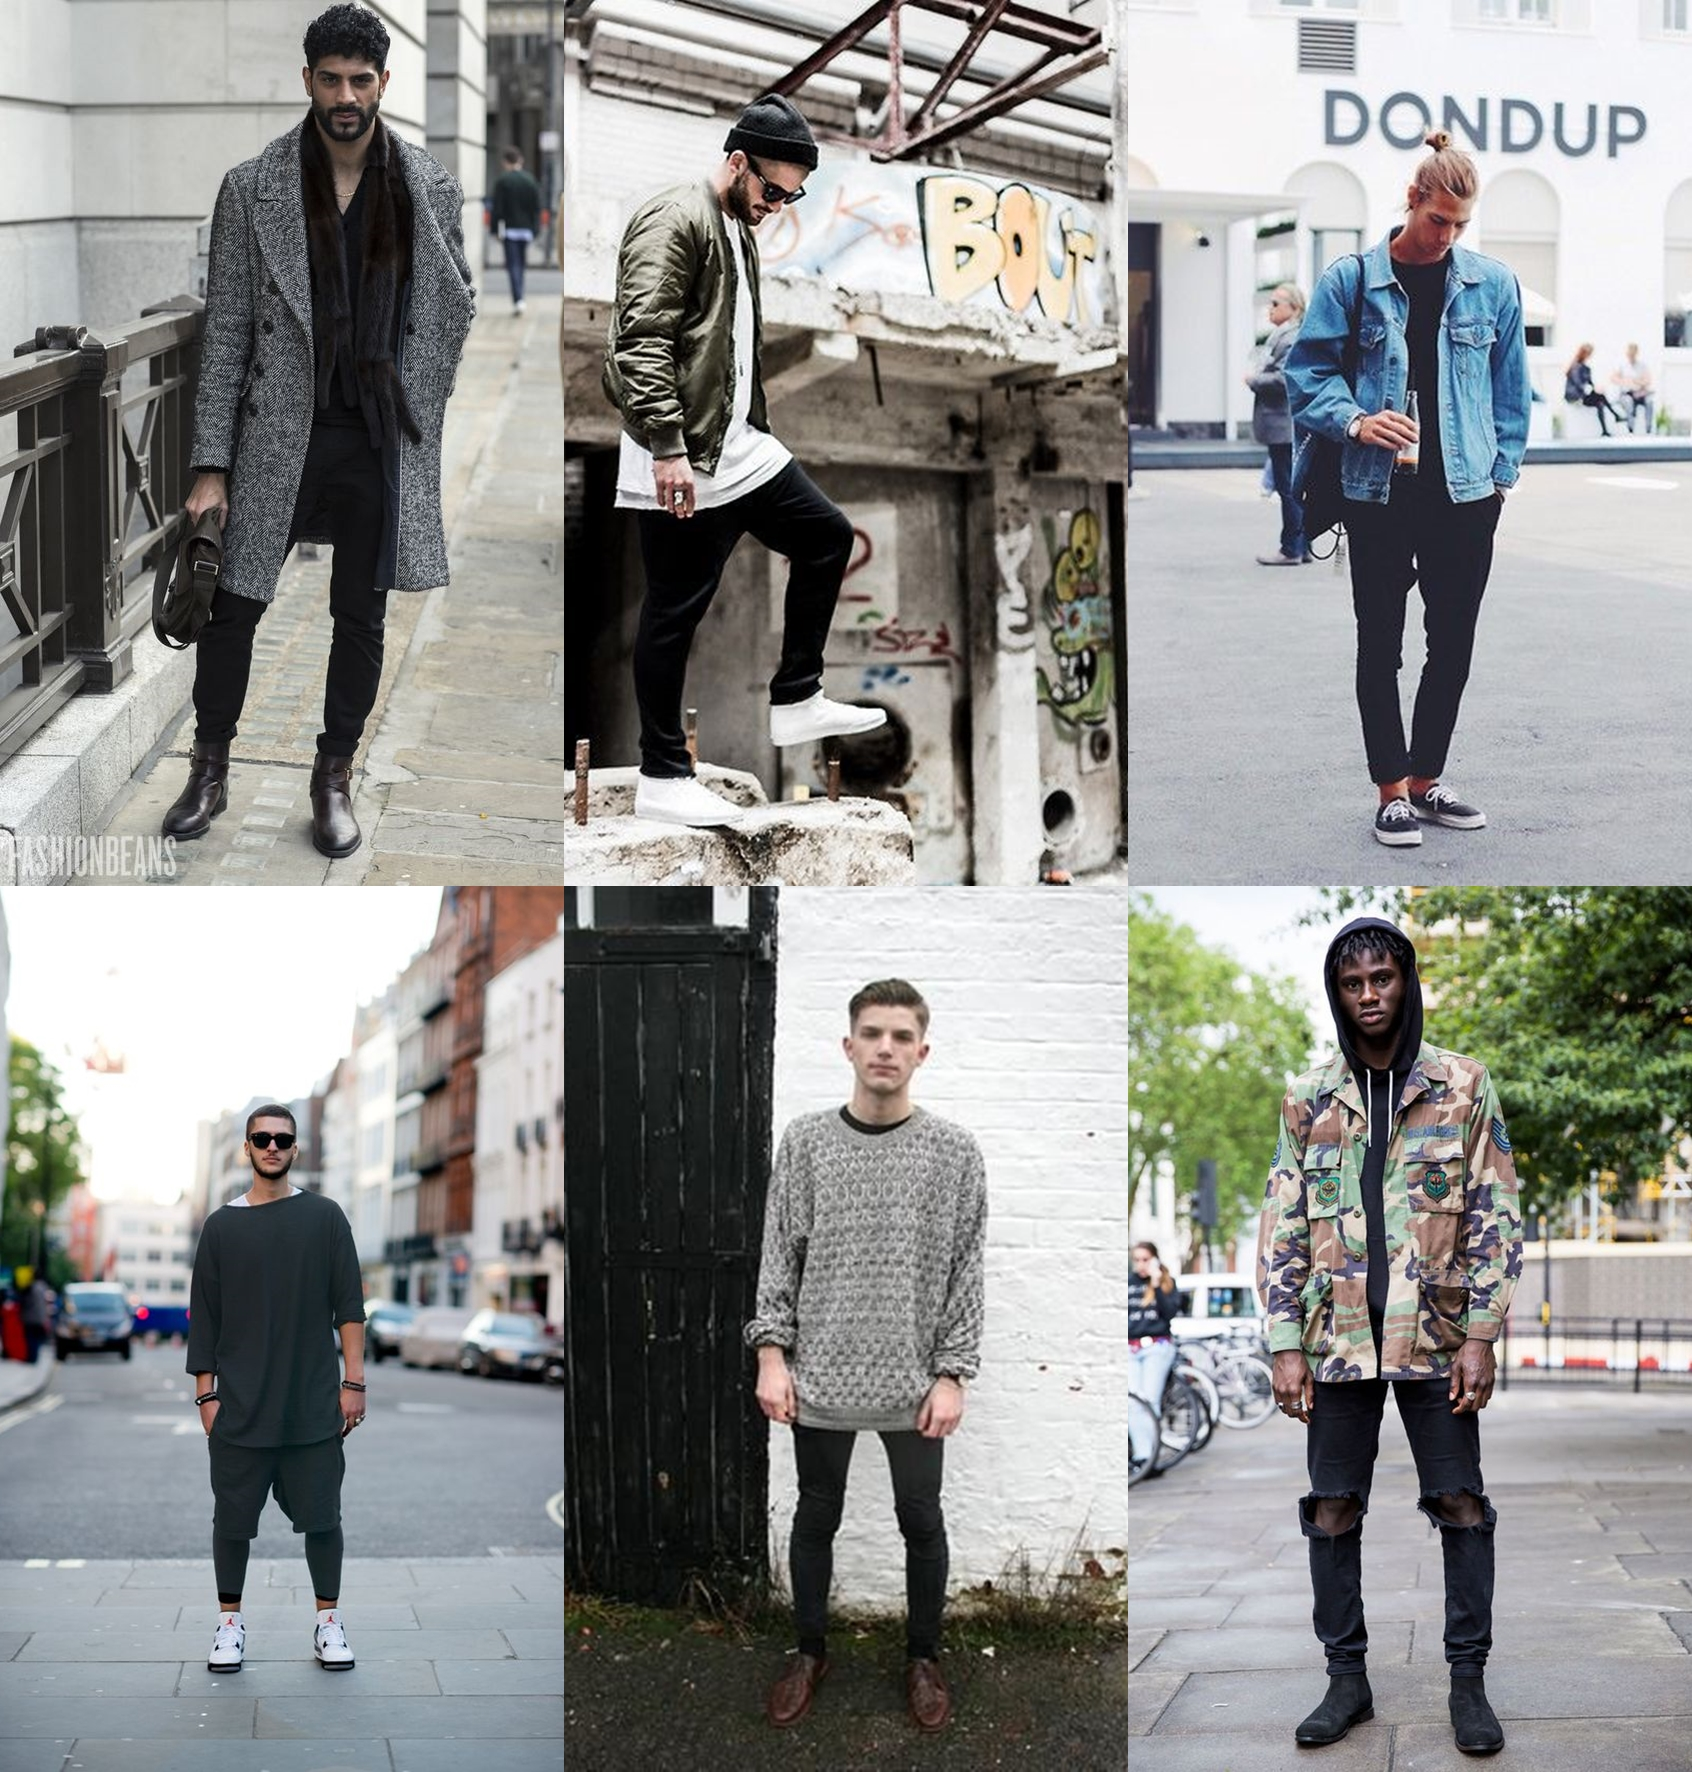 tendencia de moda masculina 2017, tendencia masculina inverno 2017, look masculino 2017, roupa masculina, estilo masculino, blog de moda masculina, moda sem censura, alex cursino, 3